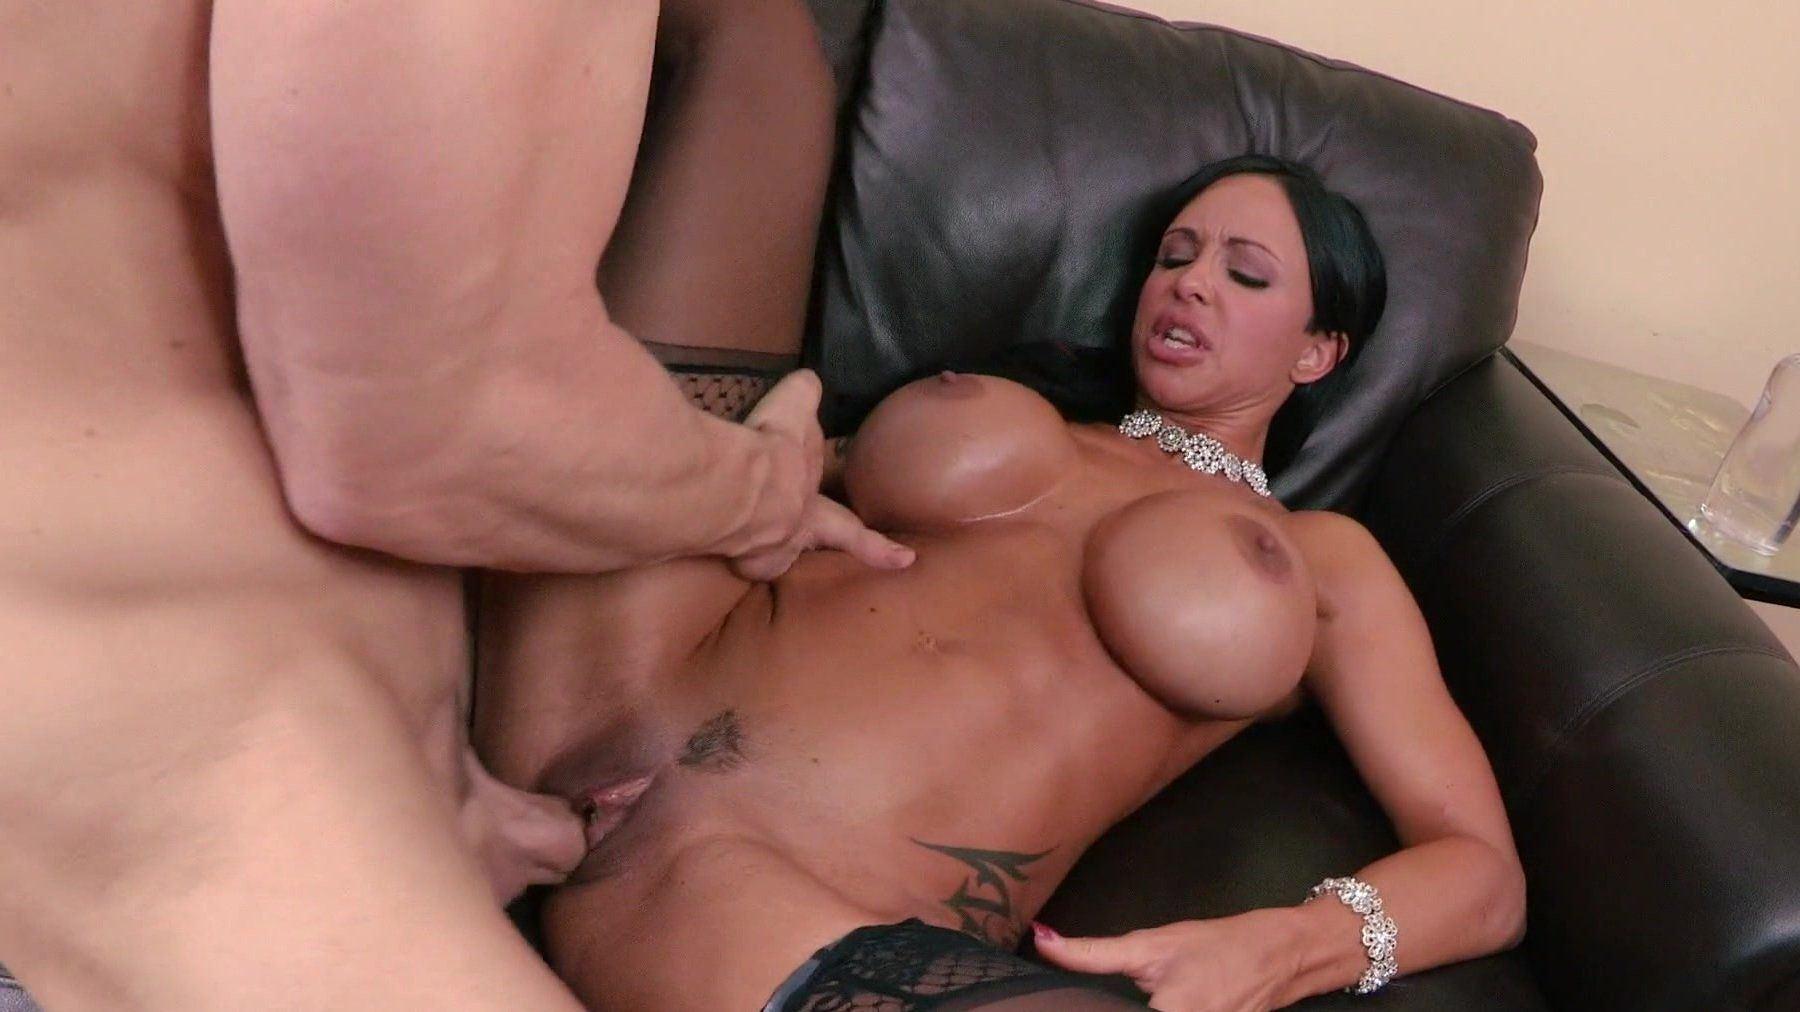 Hot big tit milf gets fucked